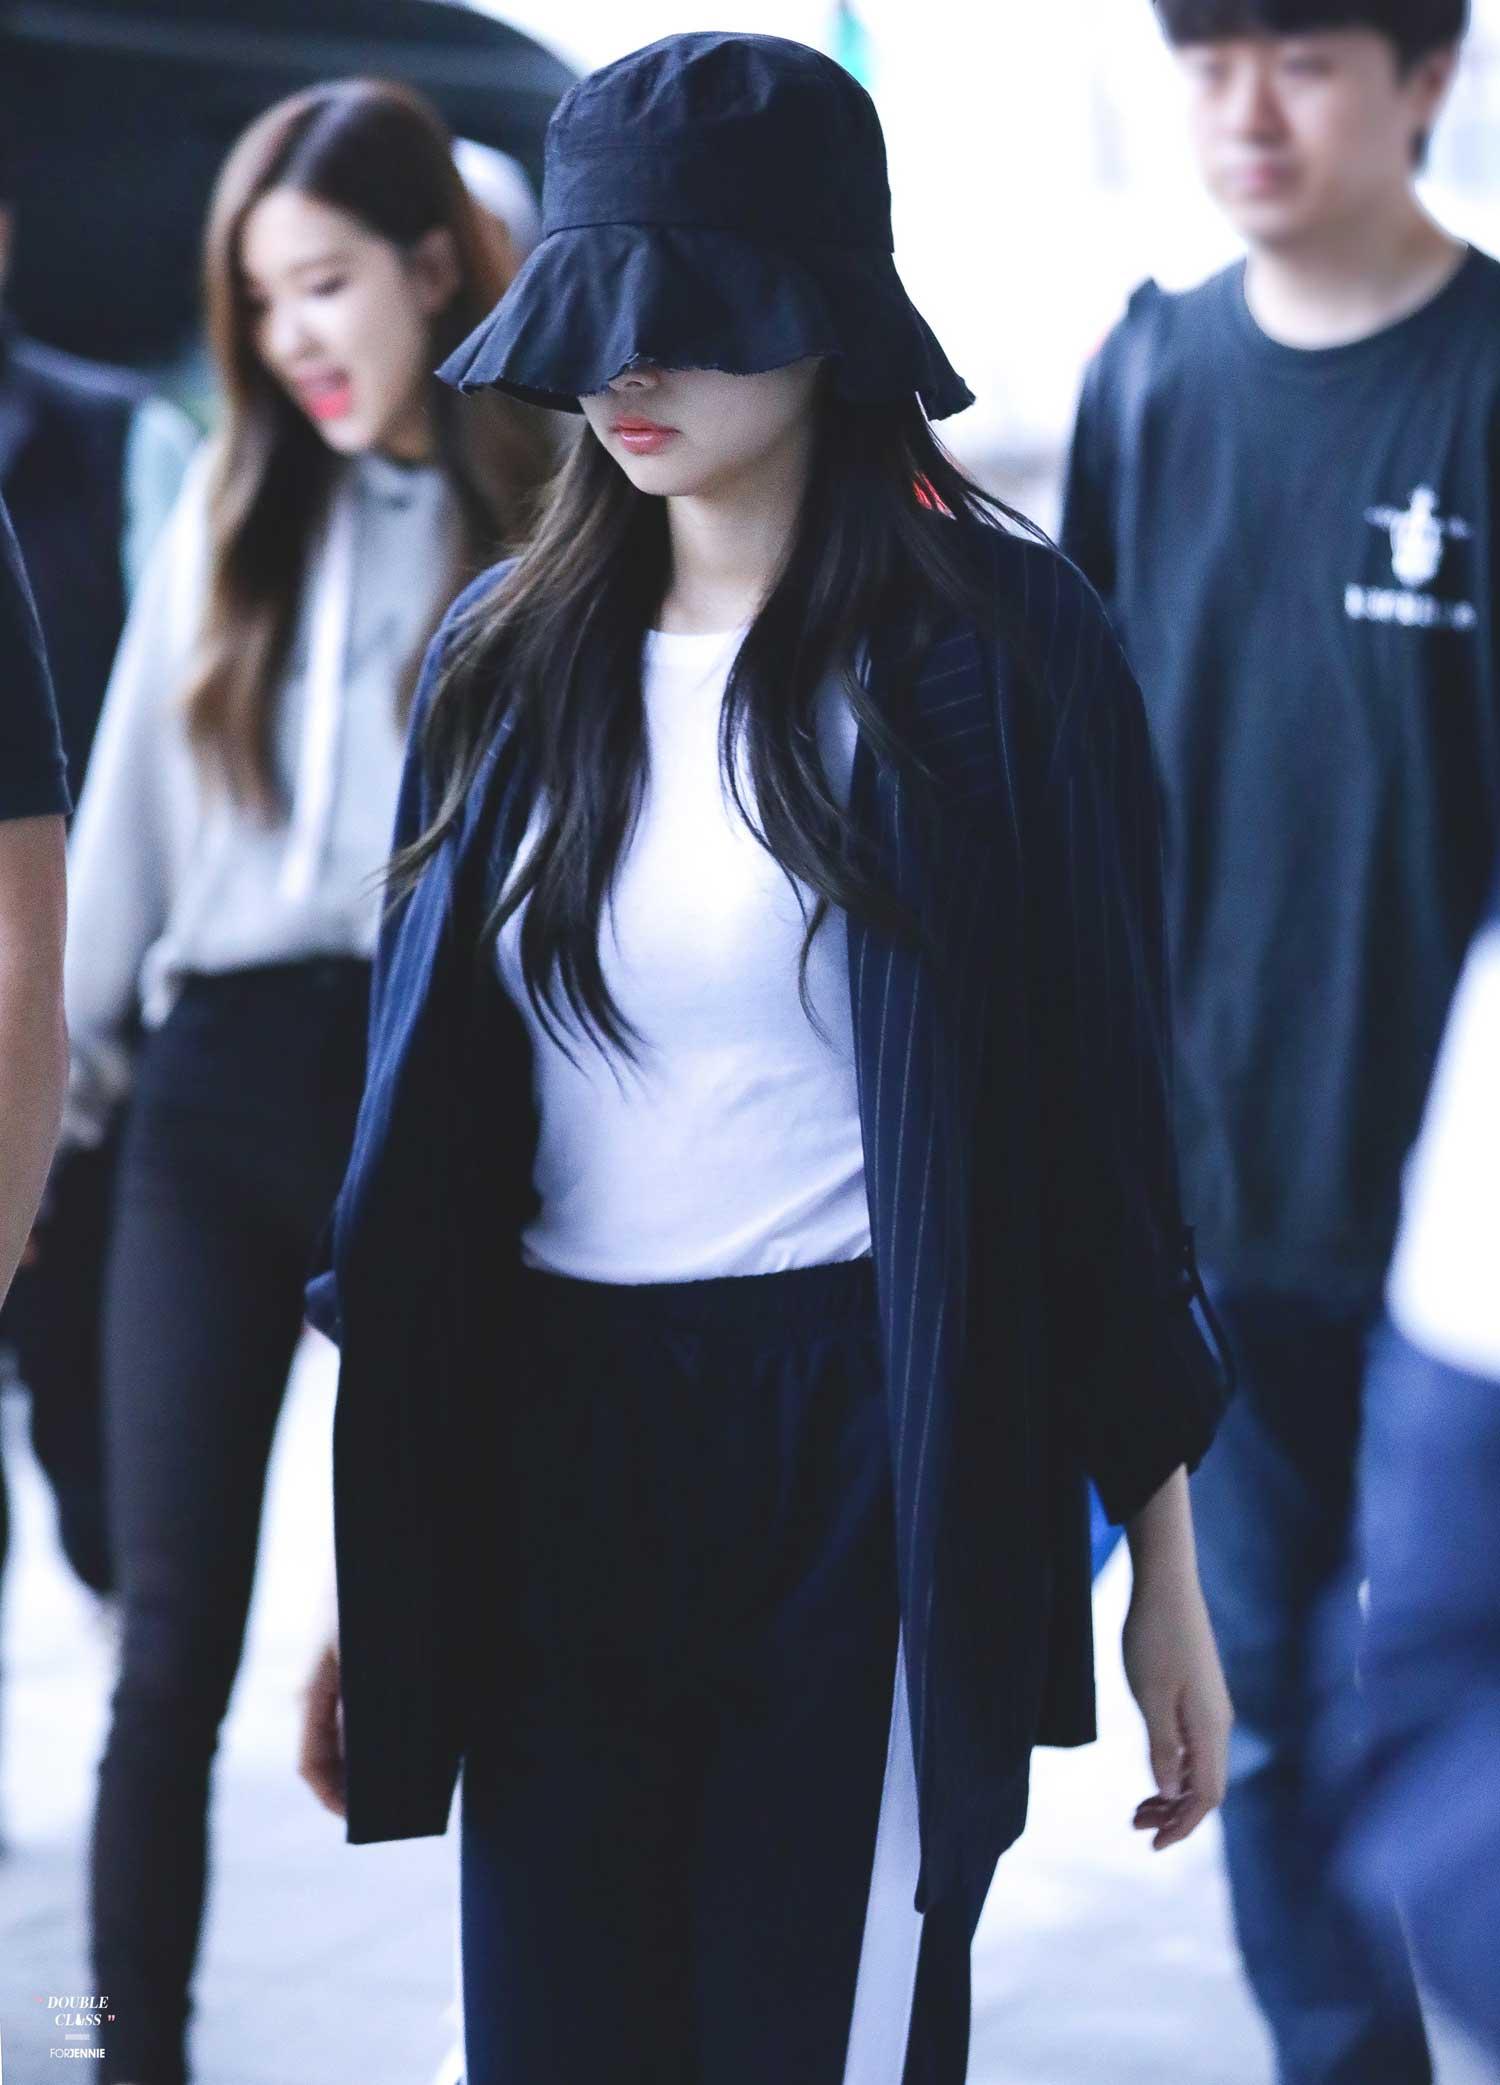 Blackpink Jennie Airport Fashion 5 April 2018 Incheon